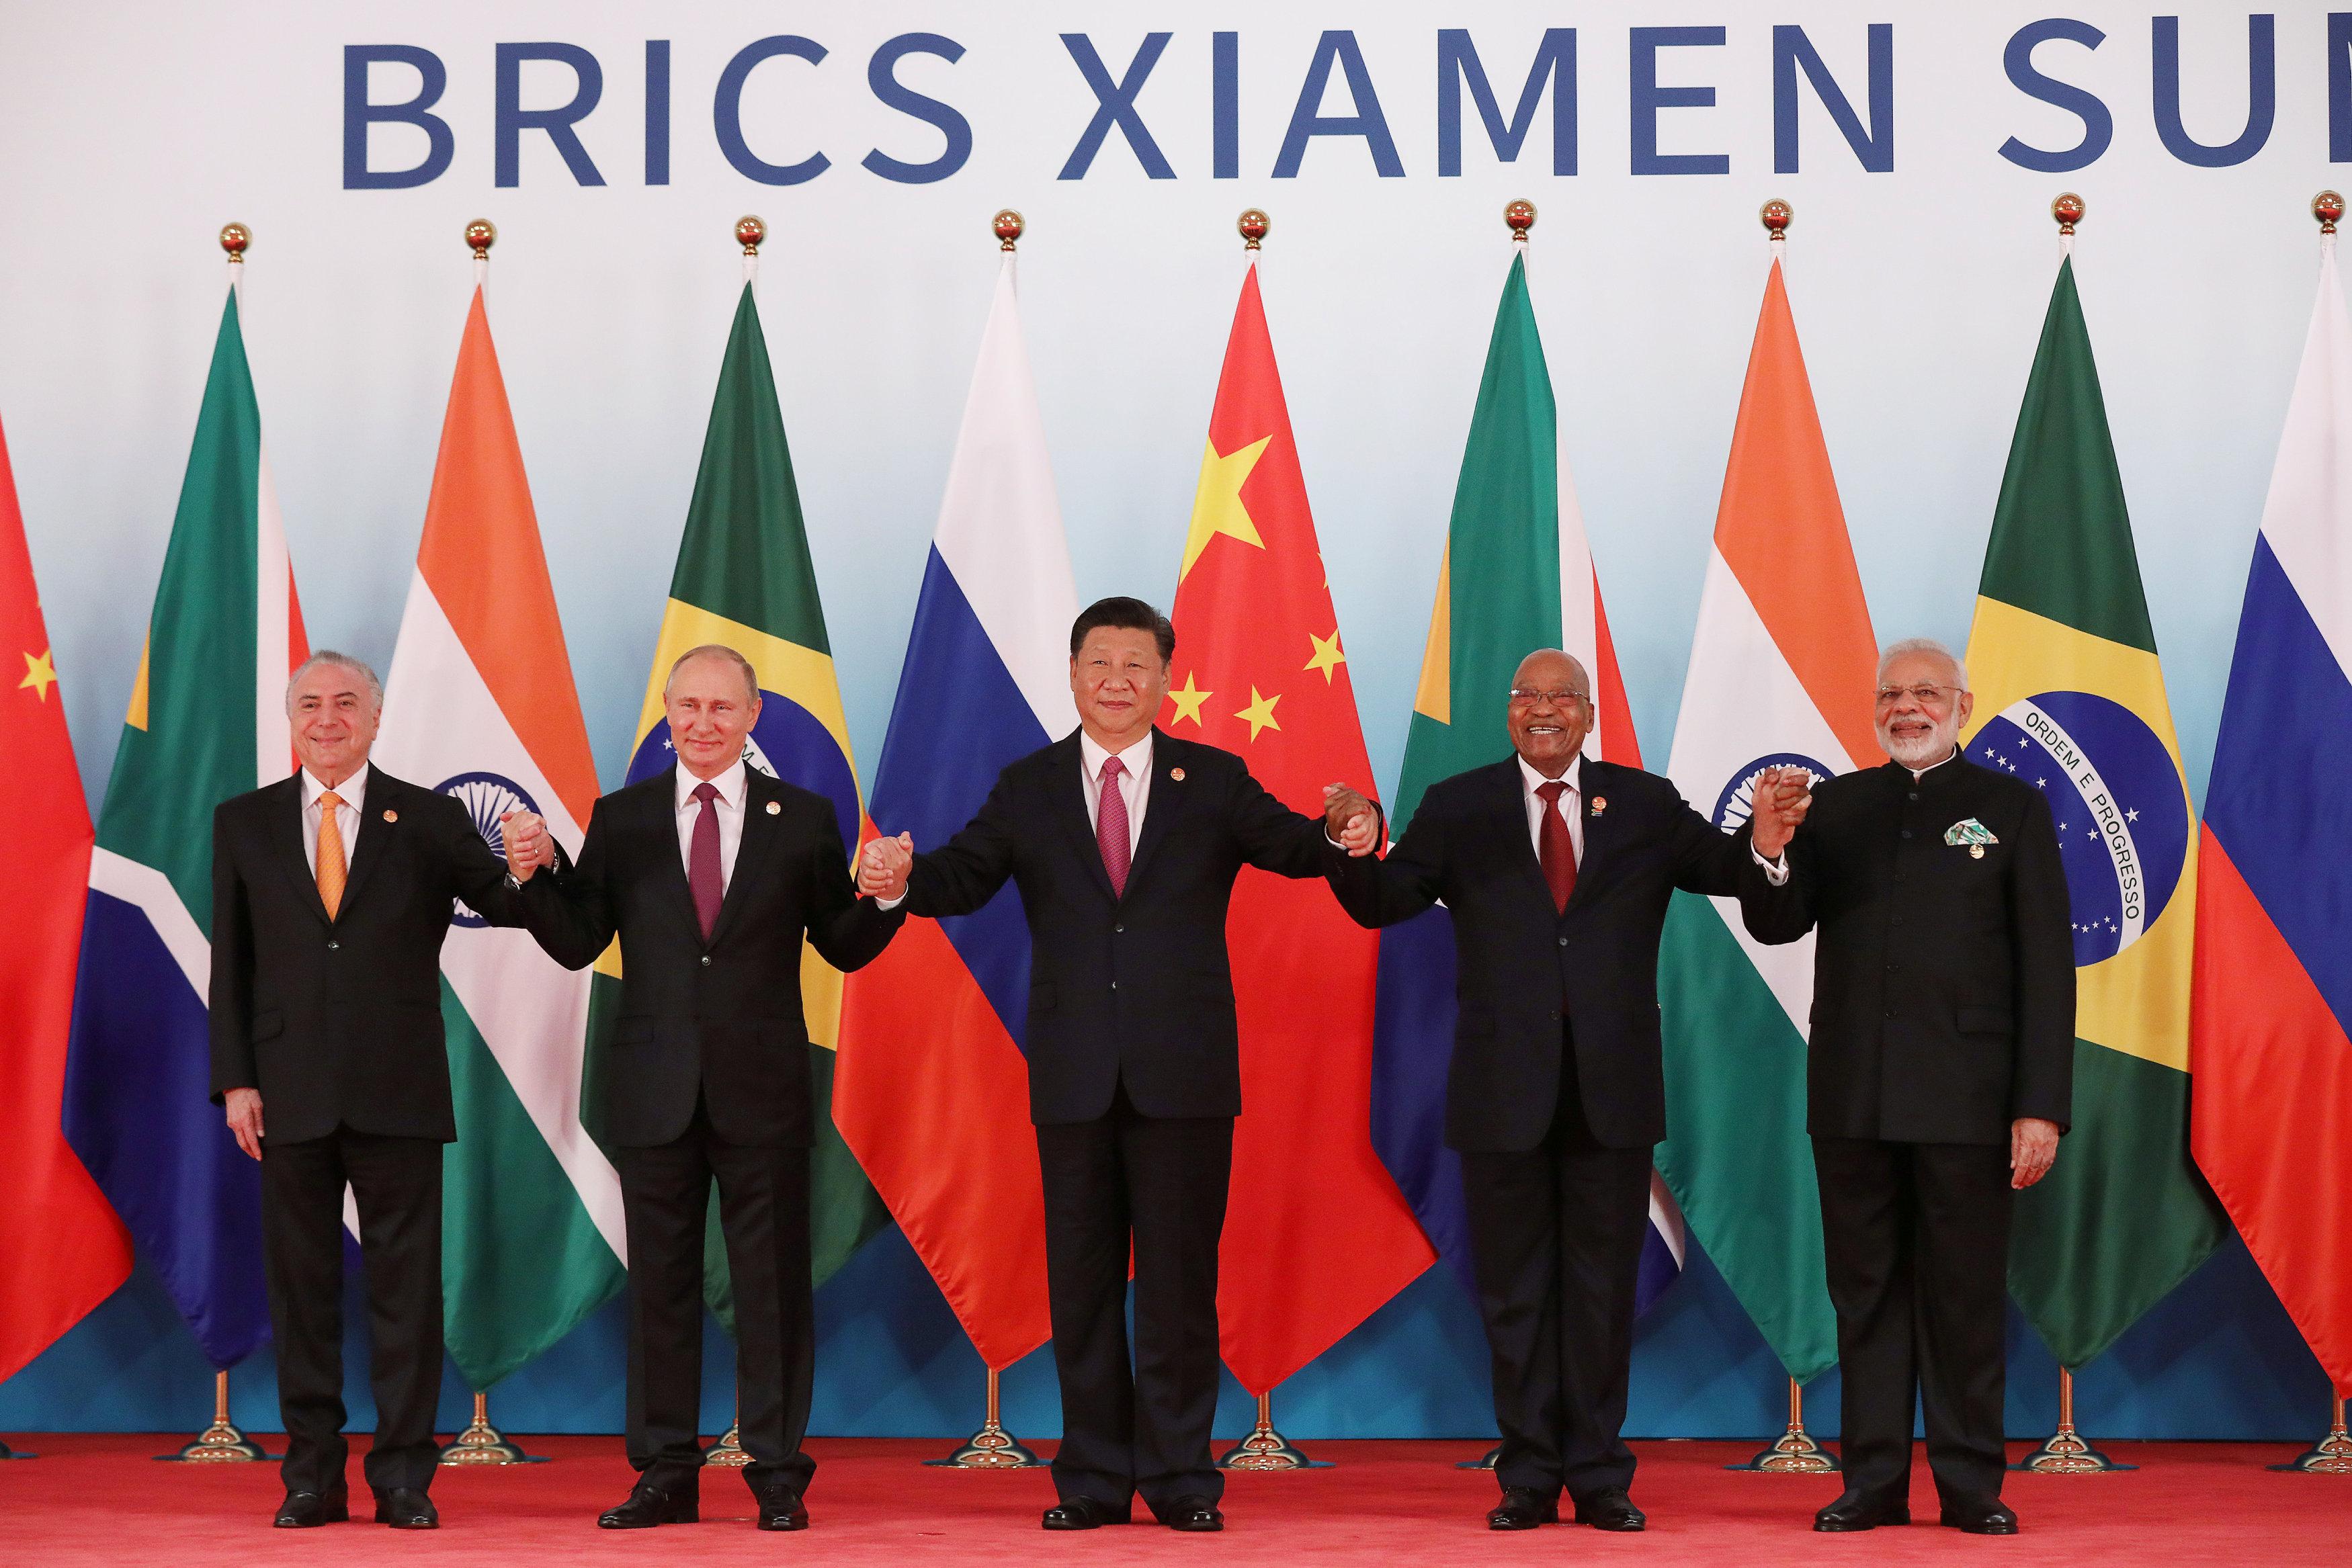 China to provide $76 million for BRICS economic initiative